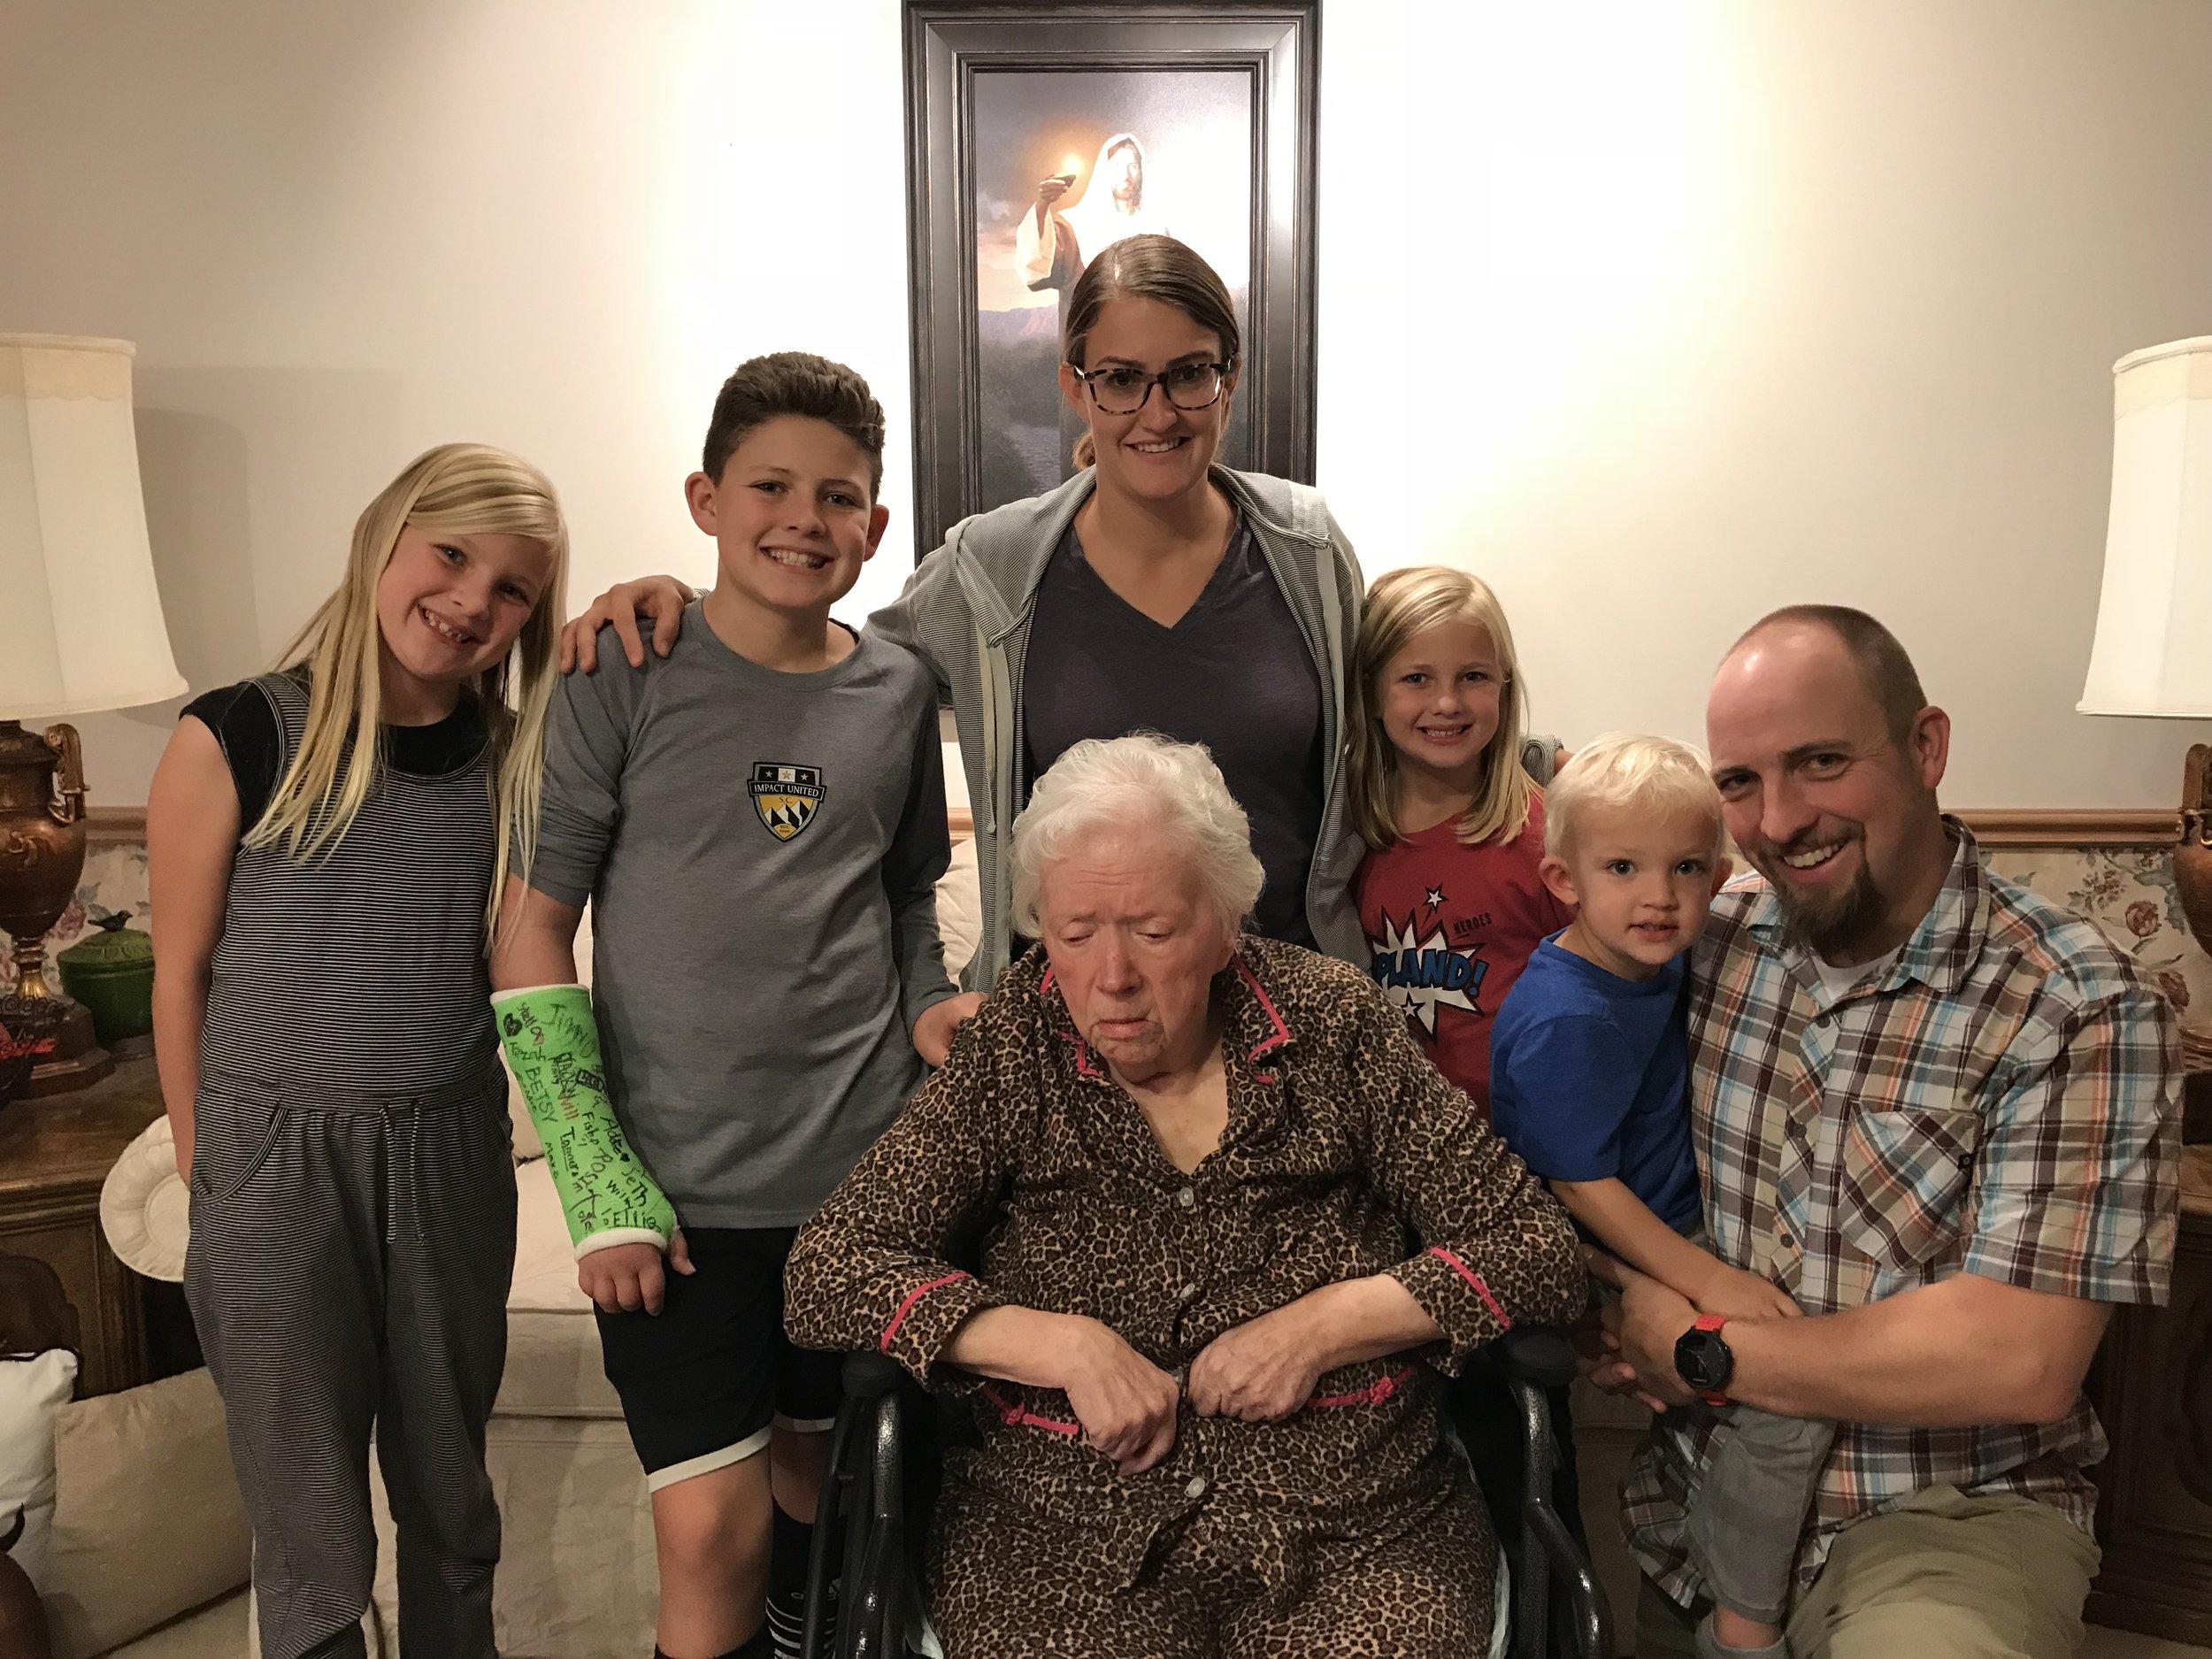 Family Celebrating 91 YEARS